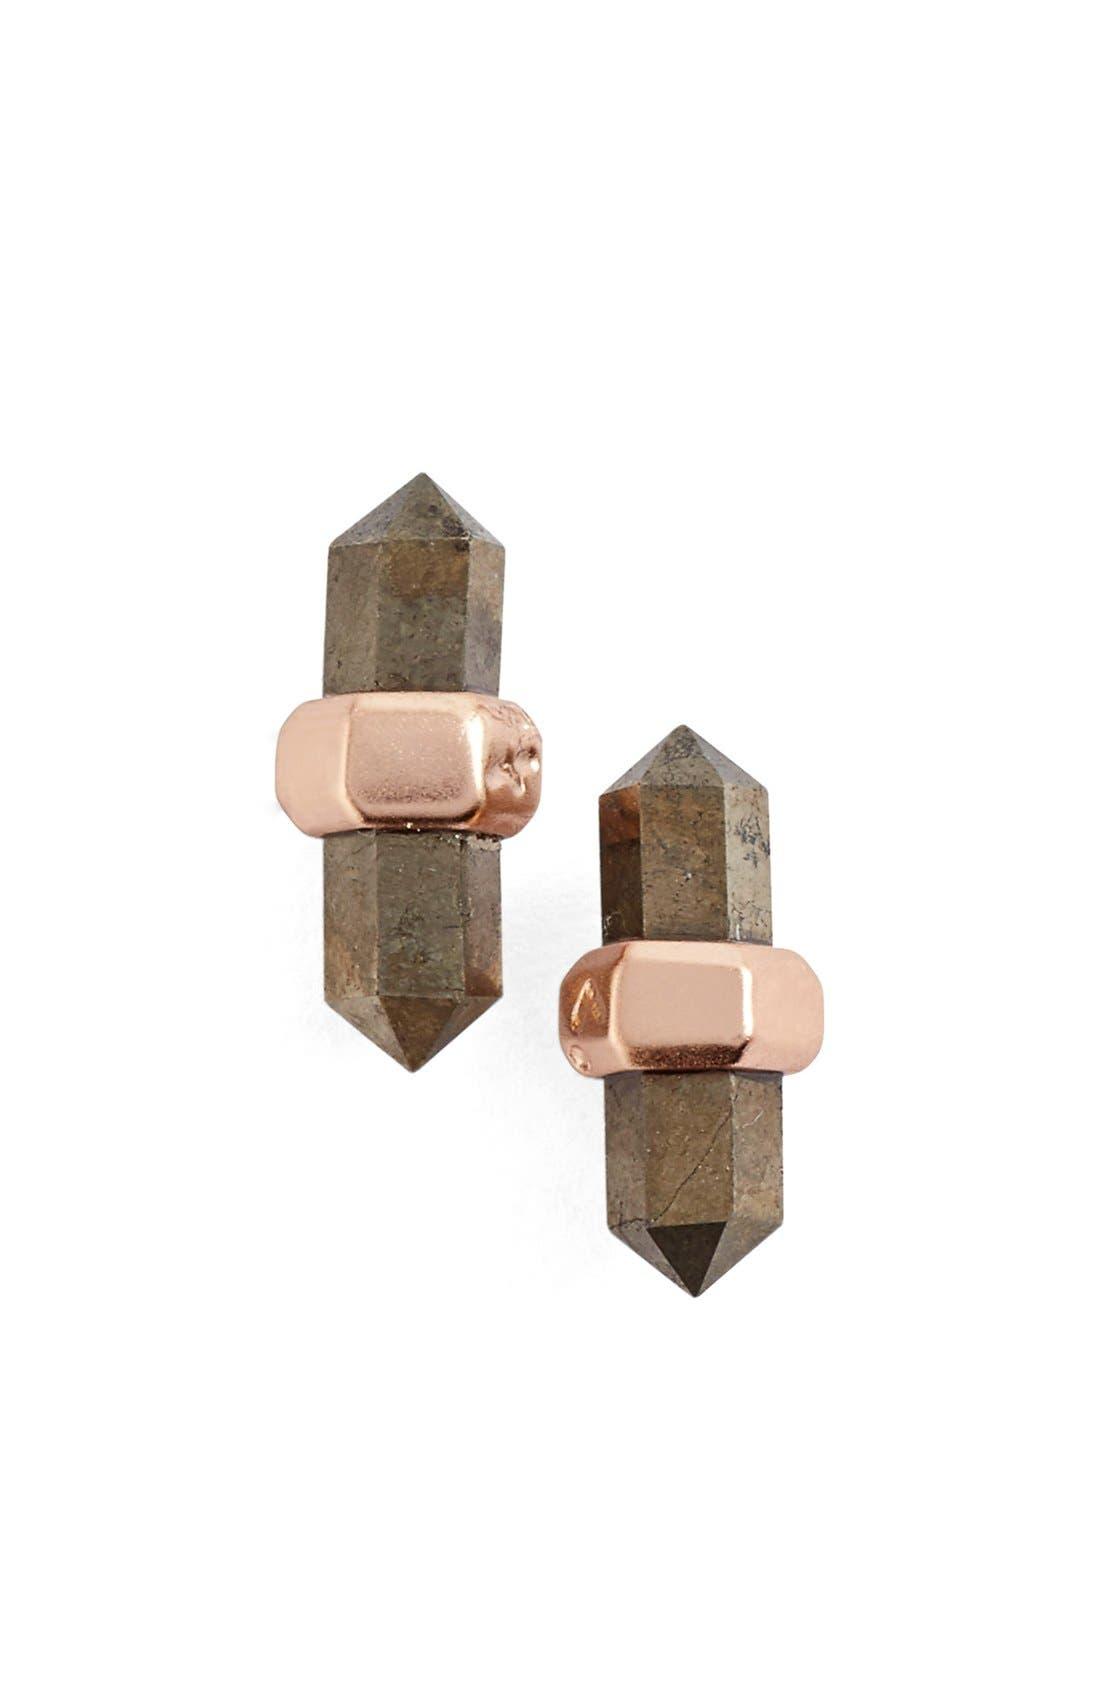 Alternate Image 1 Selected - Kendra Scott 'Joanna' Stud Earrings